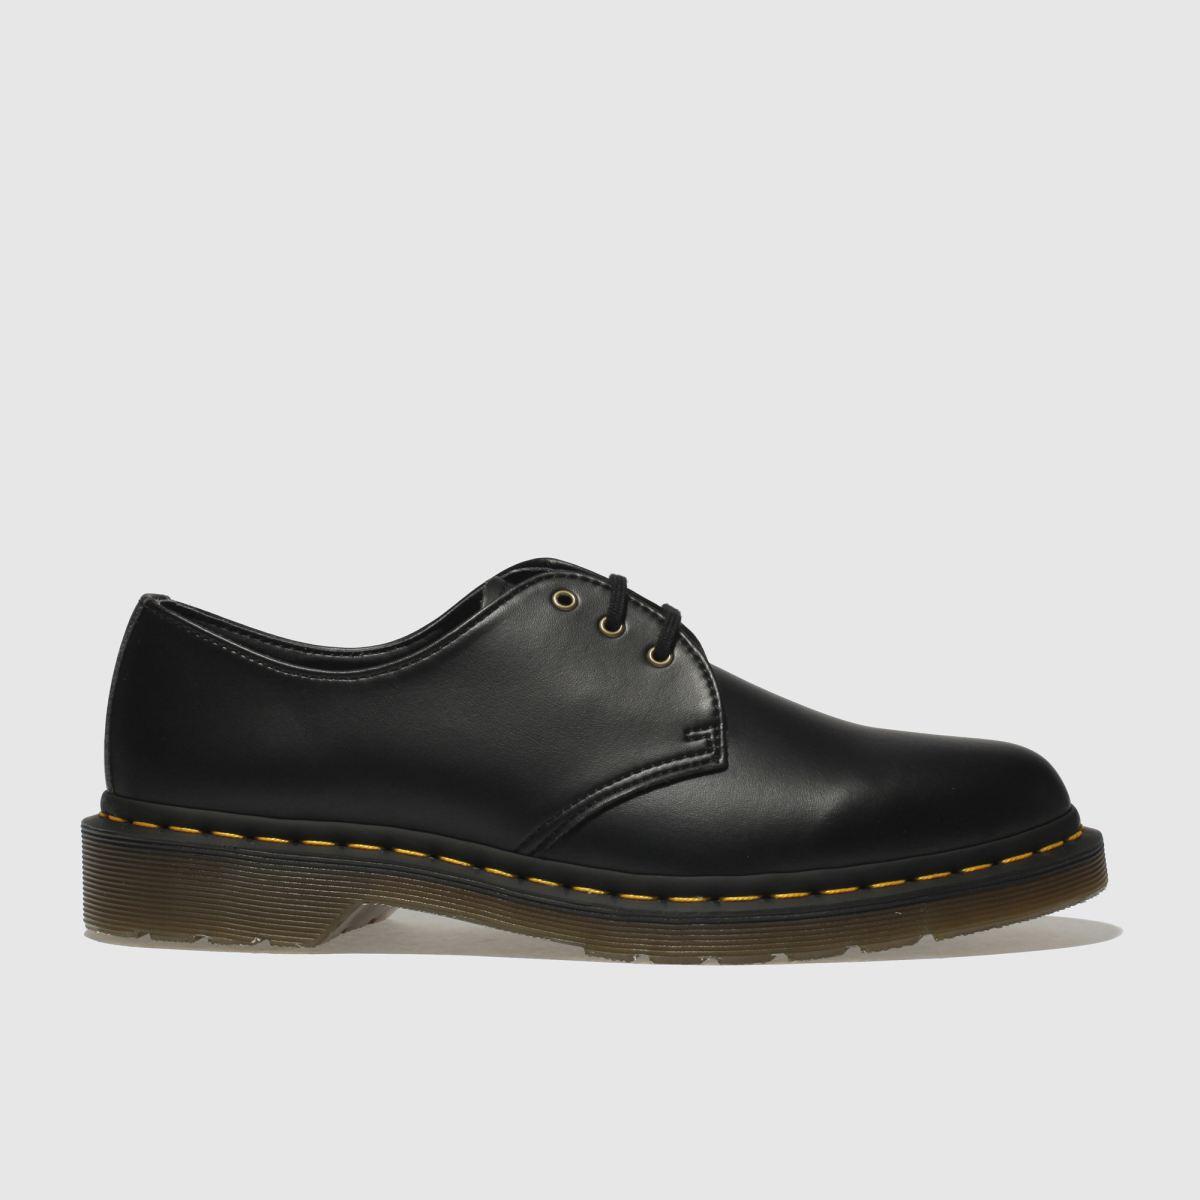 Dr Martens Black 1461 Vegan Shoes